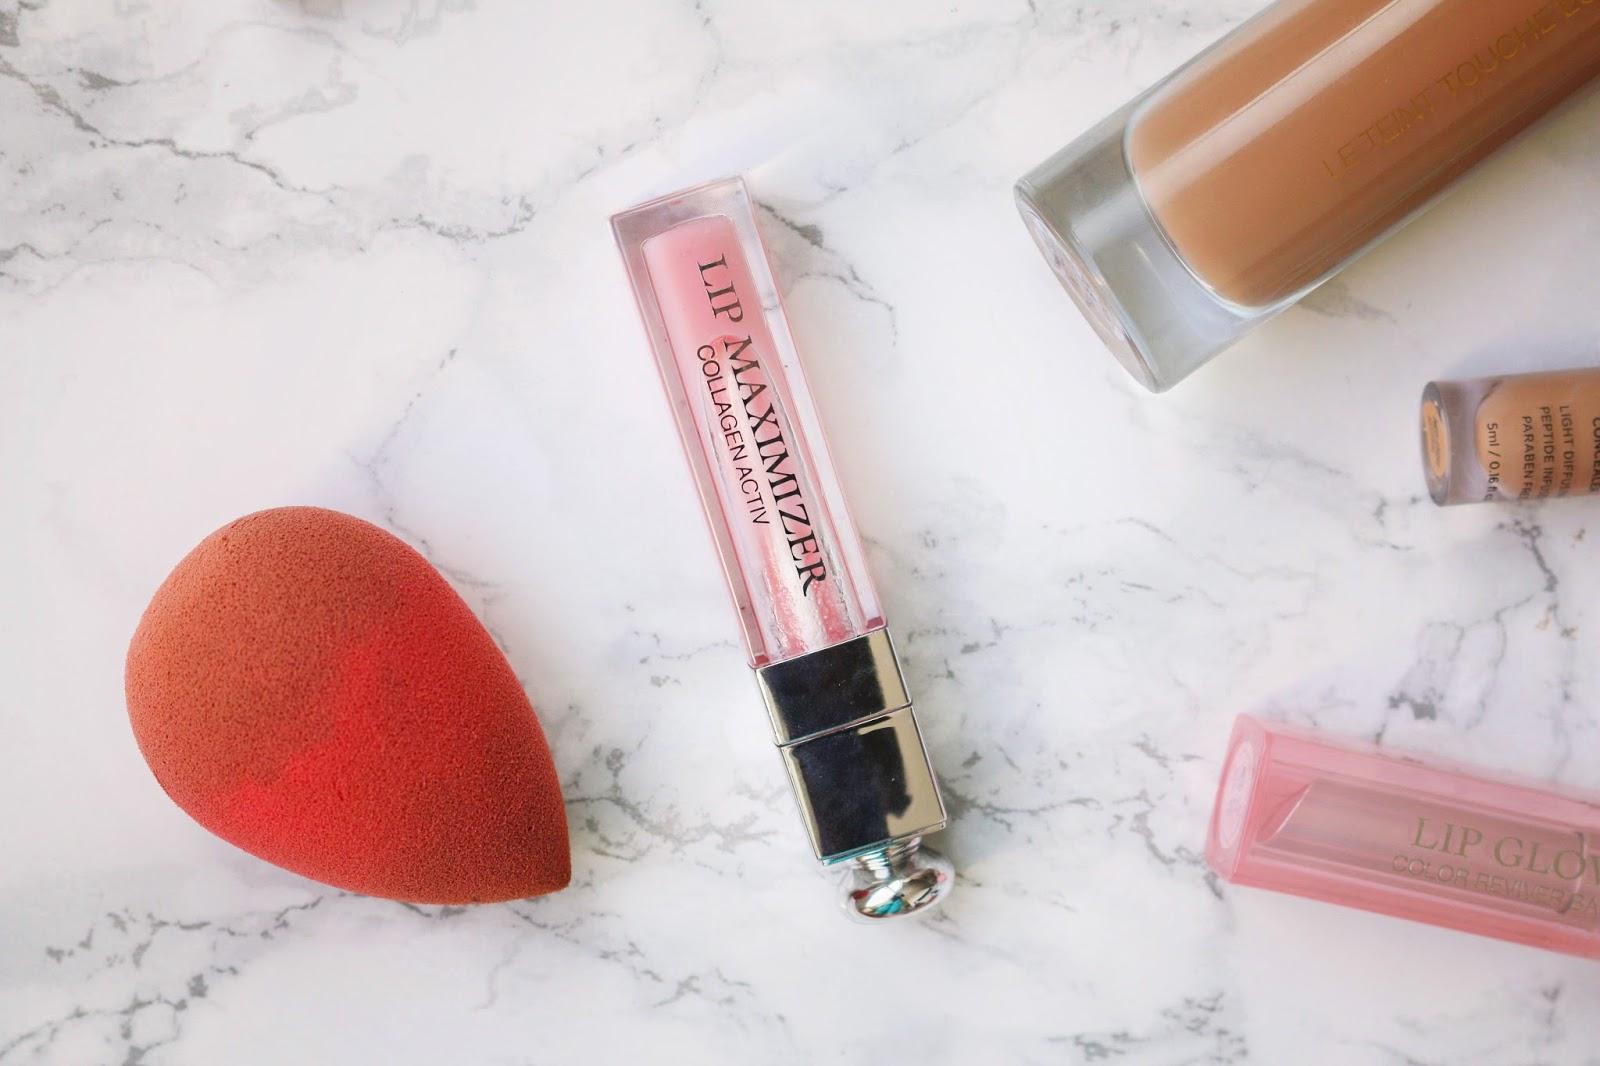 Dior Addict Lip Glow, Dior Lip Maximizer